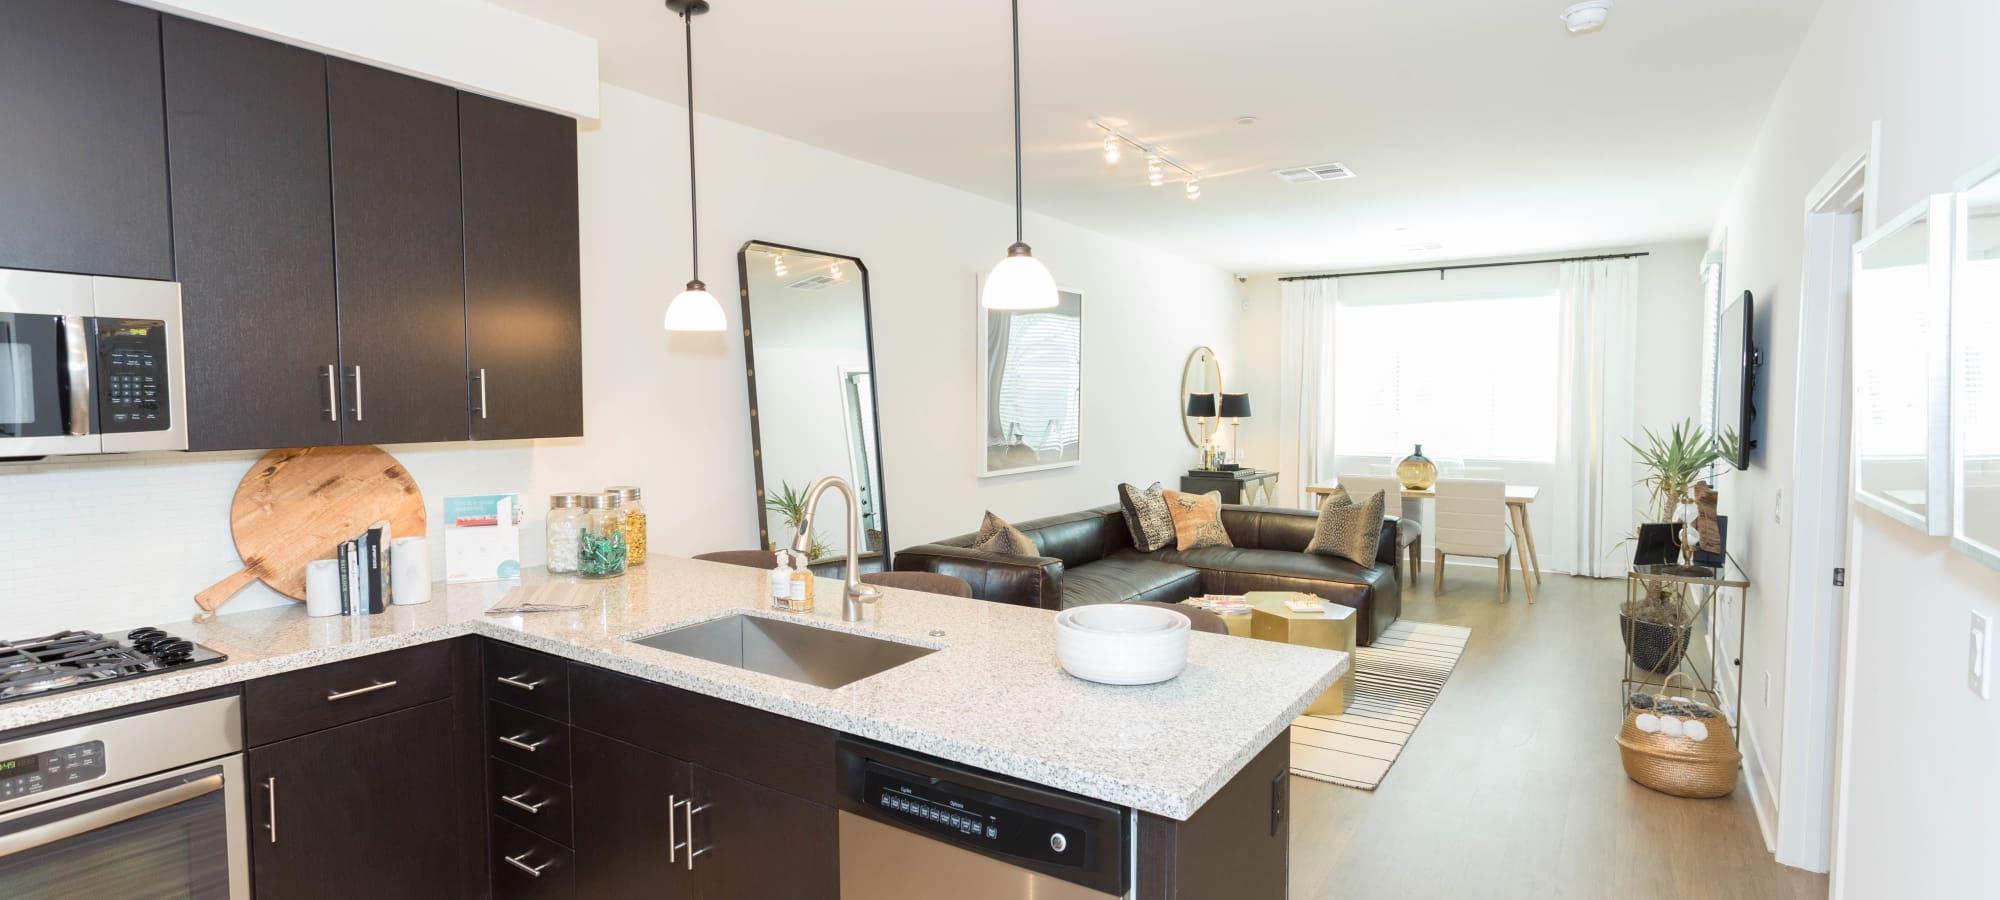 Granite countertops in model home's kitchen at Avant at Fashion Center in Chandler, Arizona